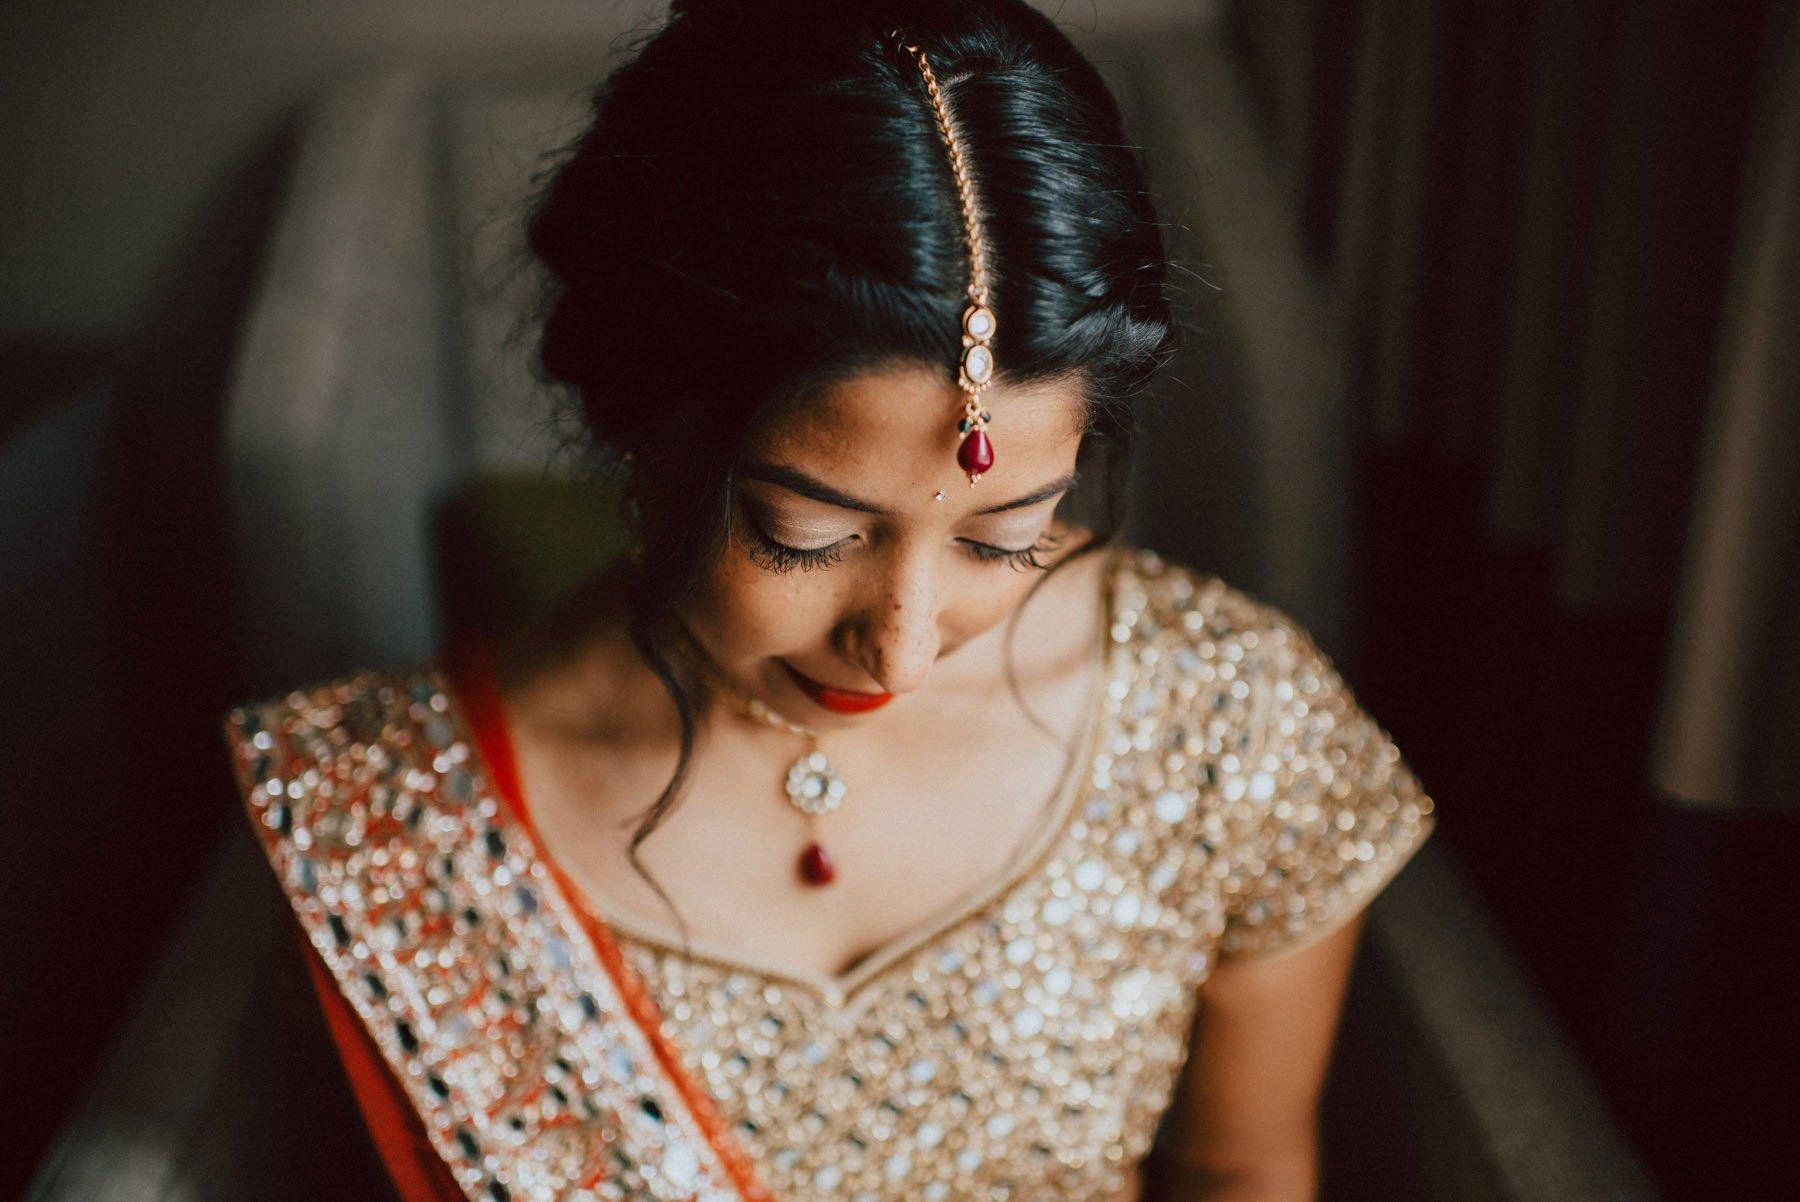 vie-philadelphia-indian-wedding-28.jpg